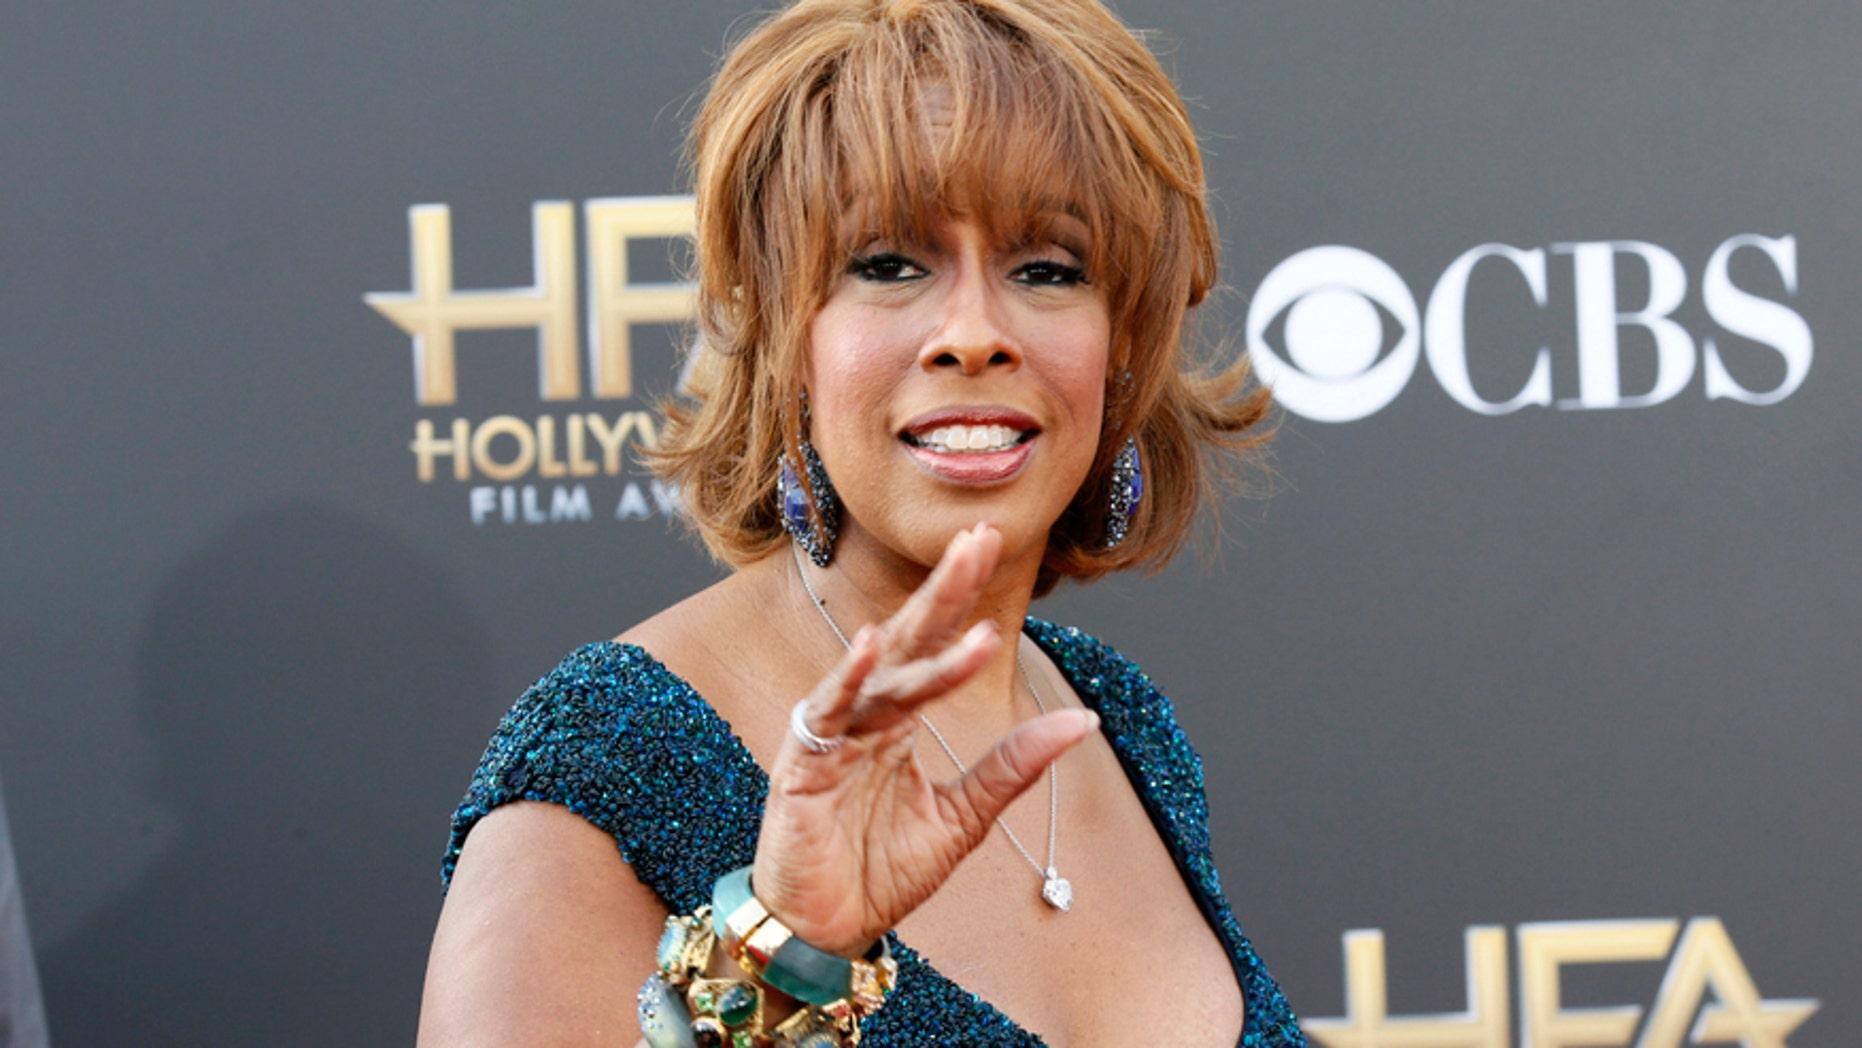 Morning talk show host Gayle King arrives at the Hollywood Film Awards in Hollywood, California November 14, 2014.